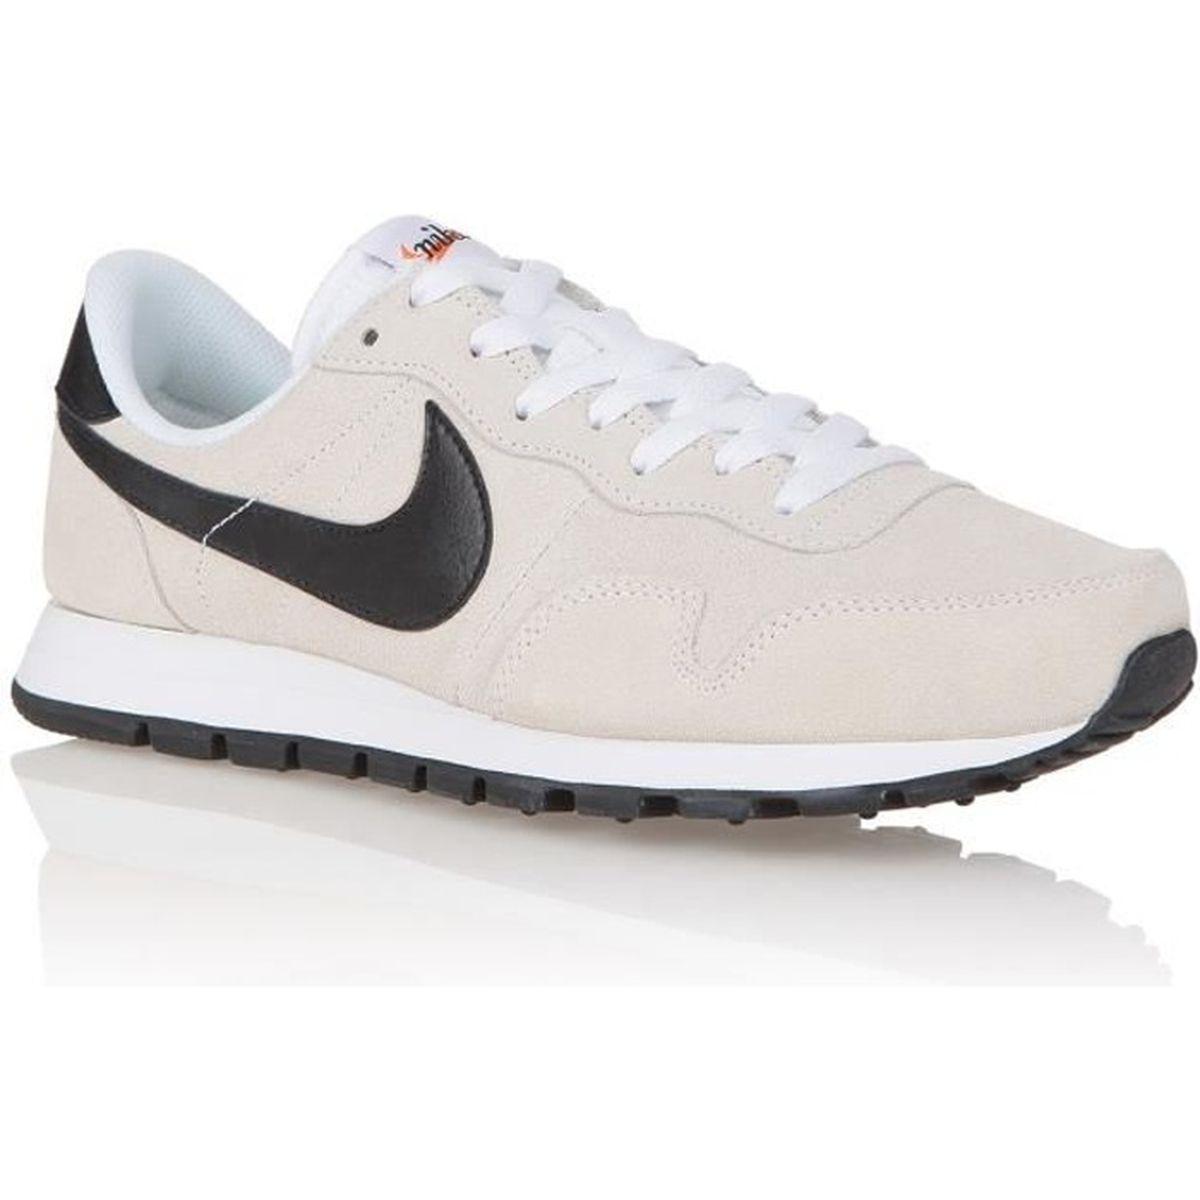 detailed pictures 45ae6 97355 Nike air pegasus 83